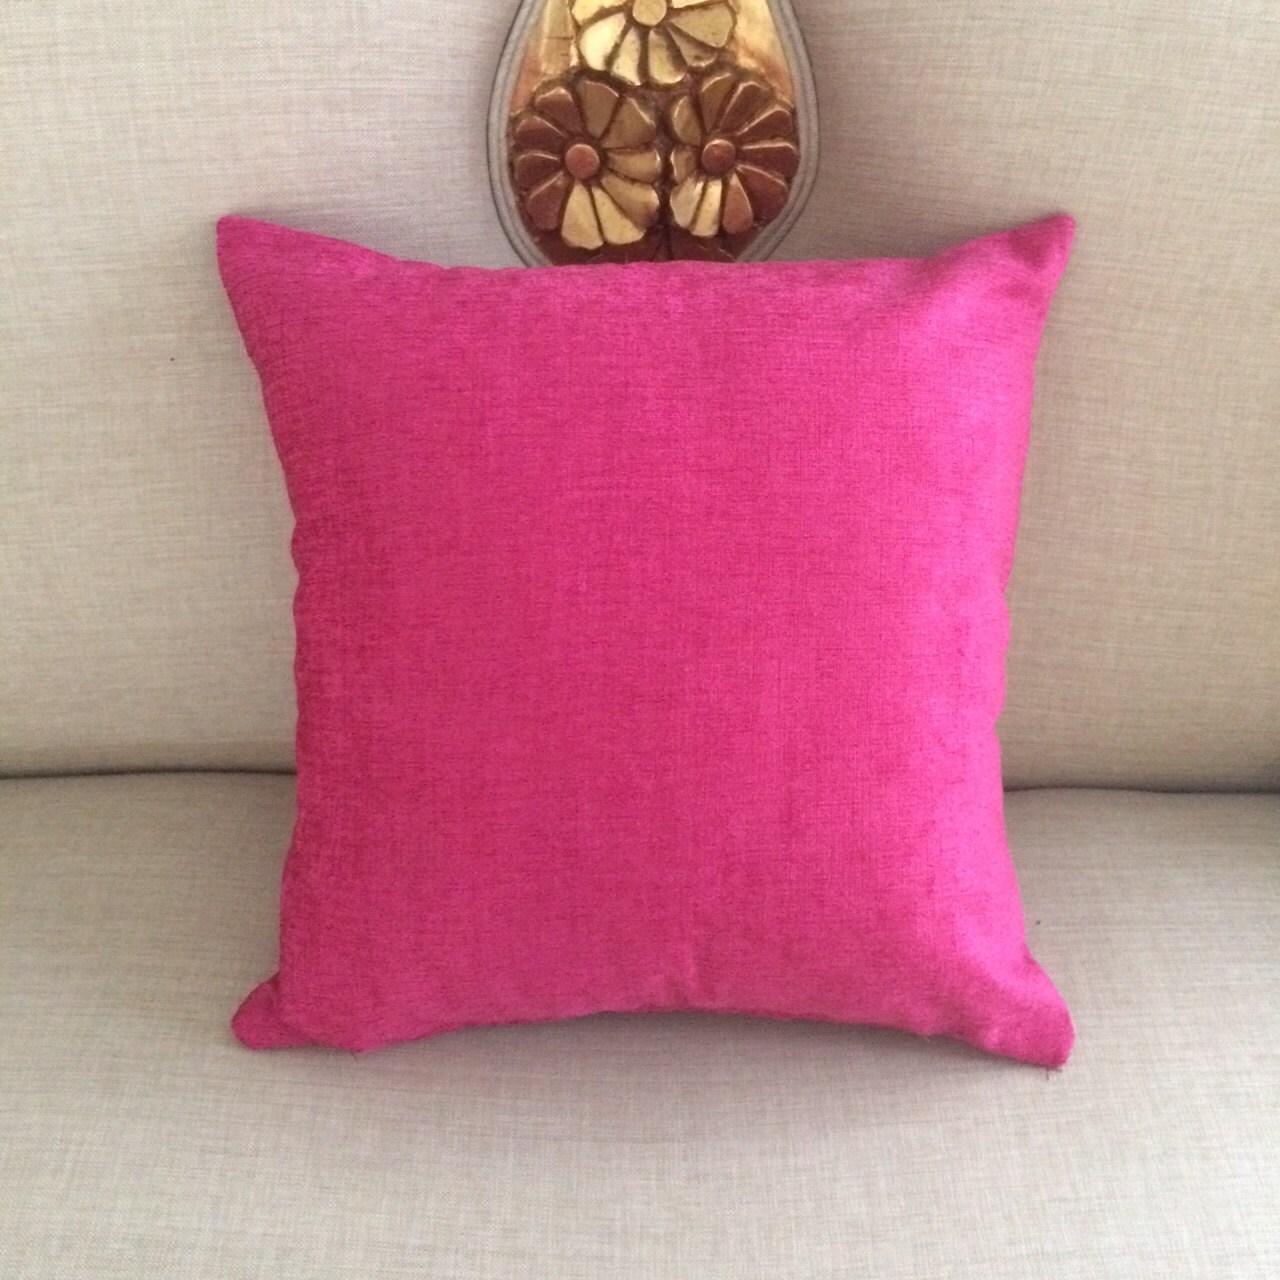 Decorative Pillow Cover Designer Pillows Interior Design 19 x 19 ...